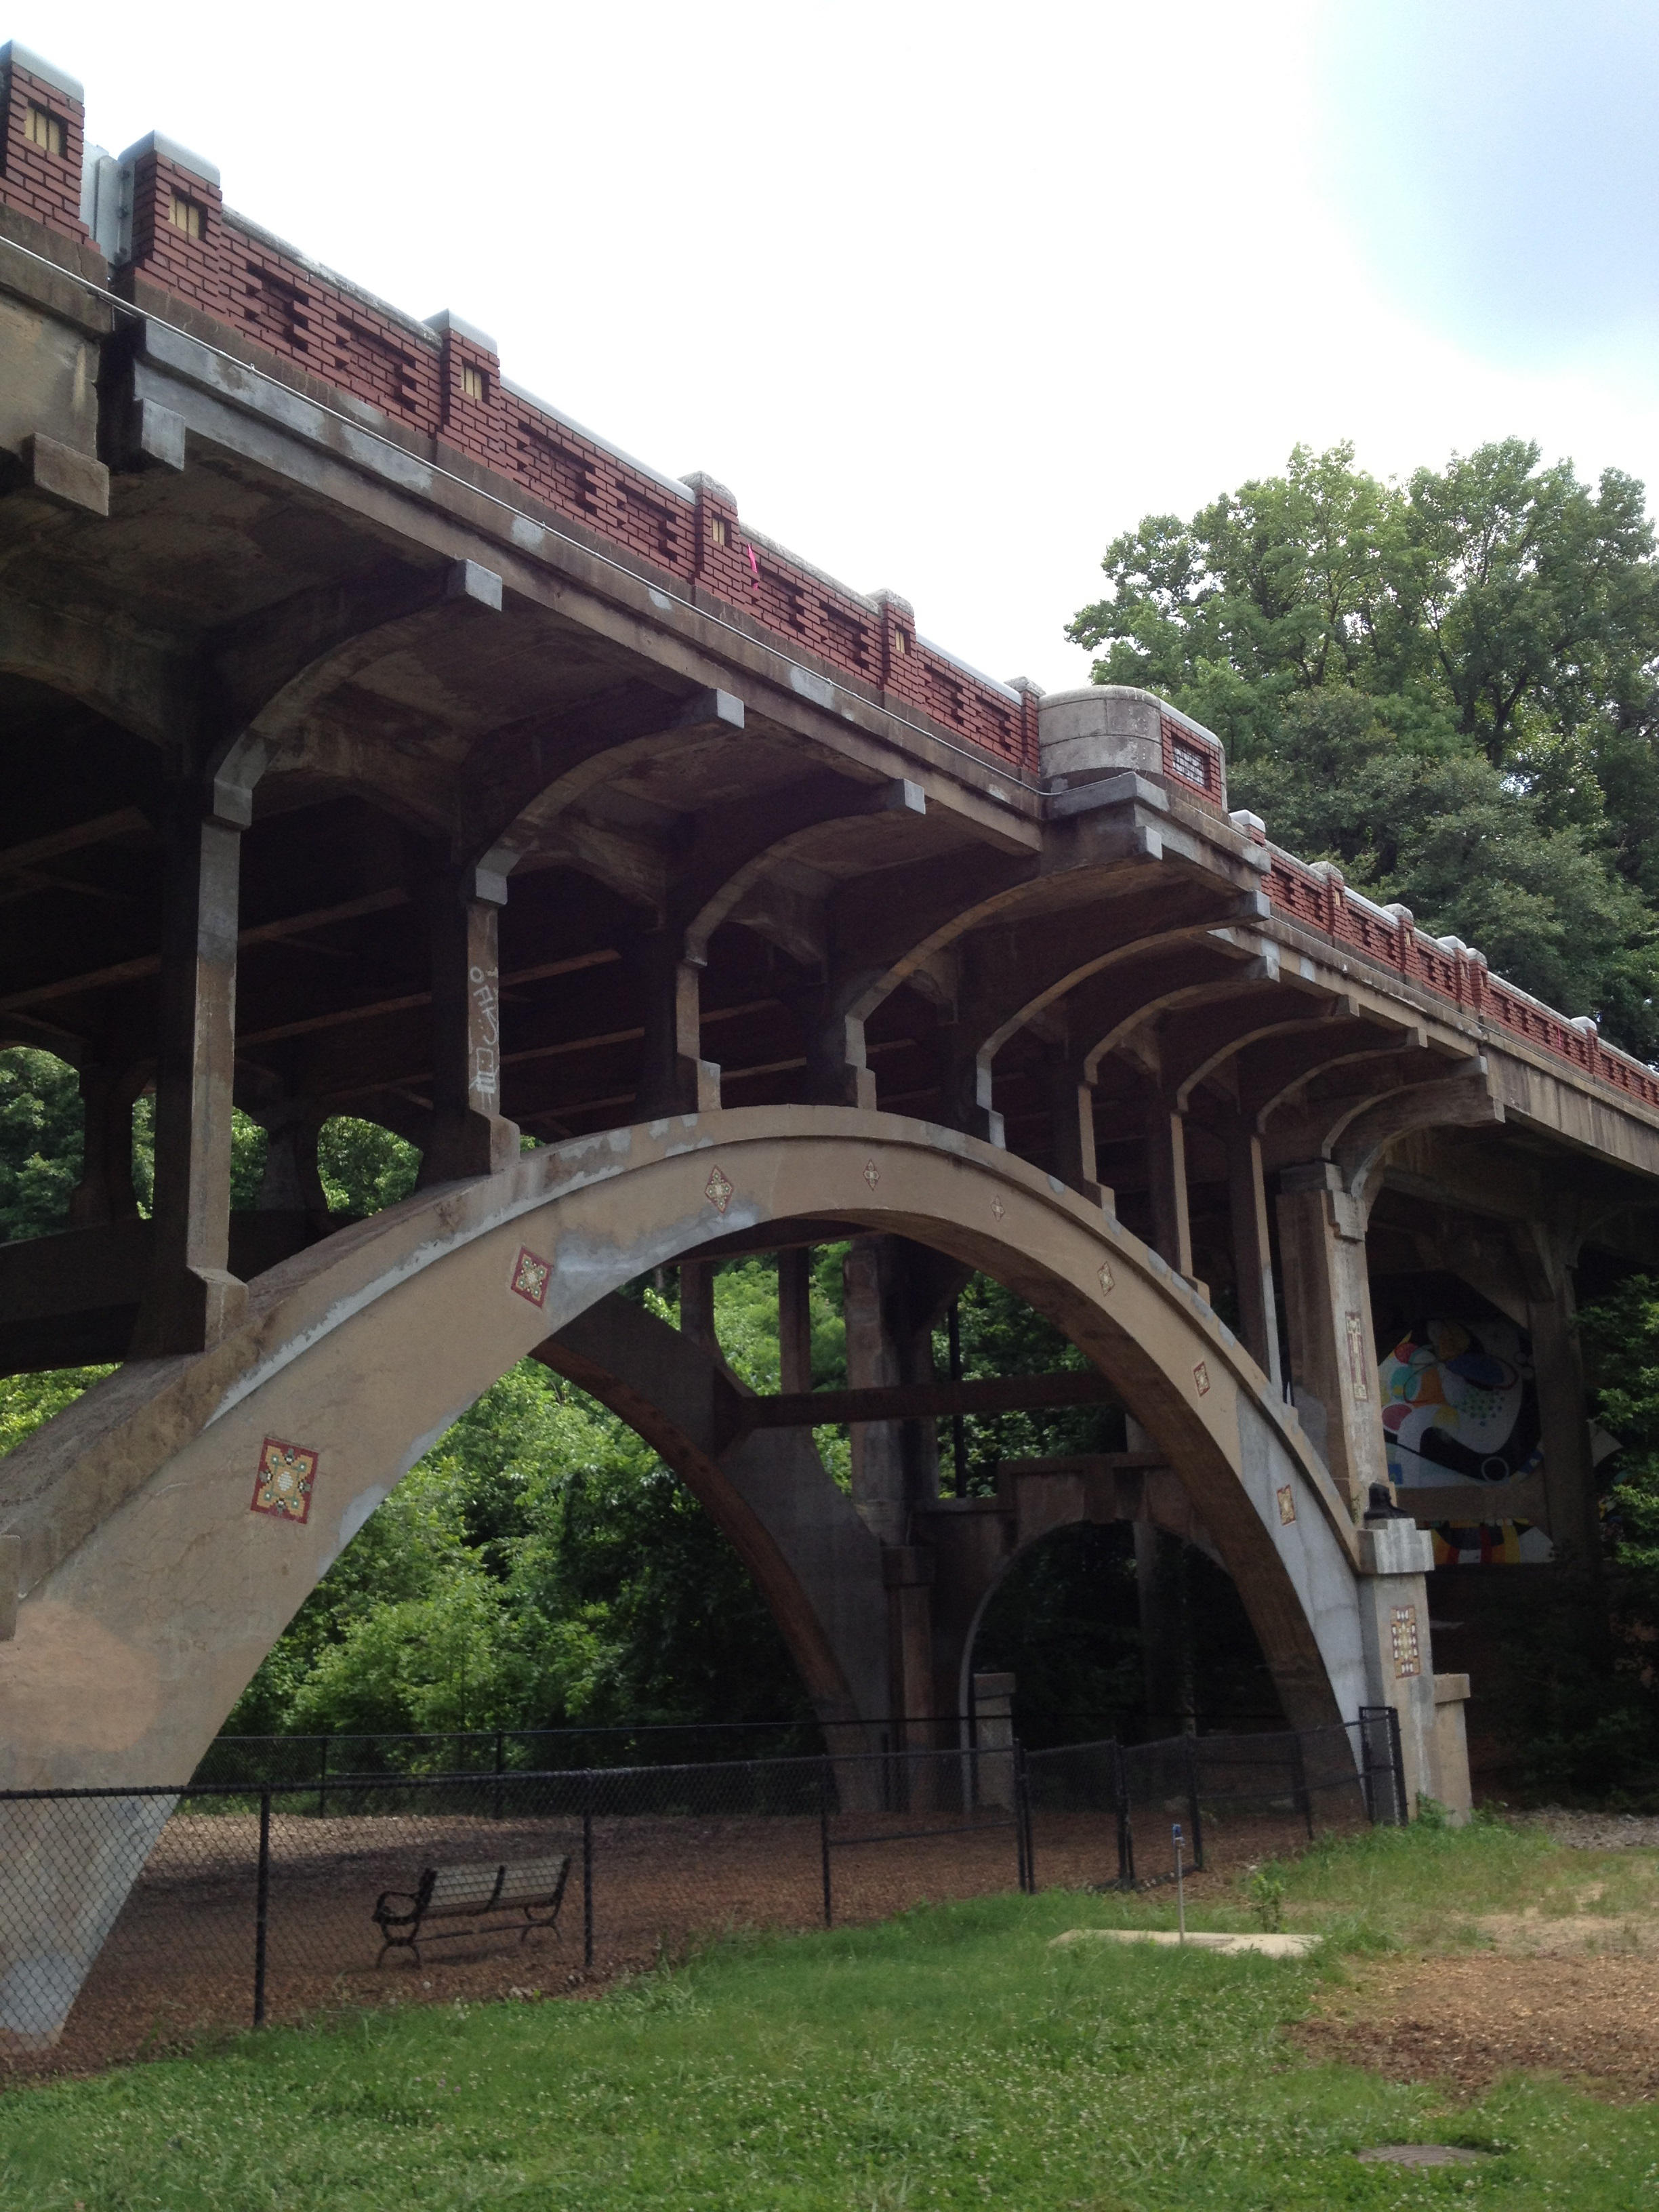 Park Drive Bridge, Piedmont Park, Atlanta